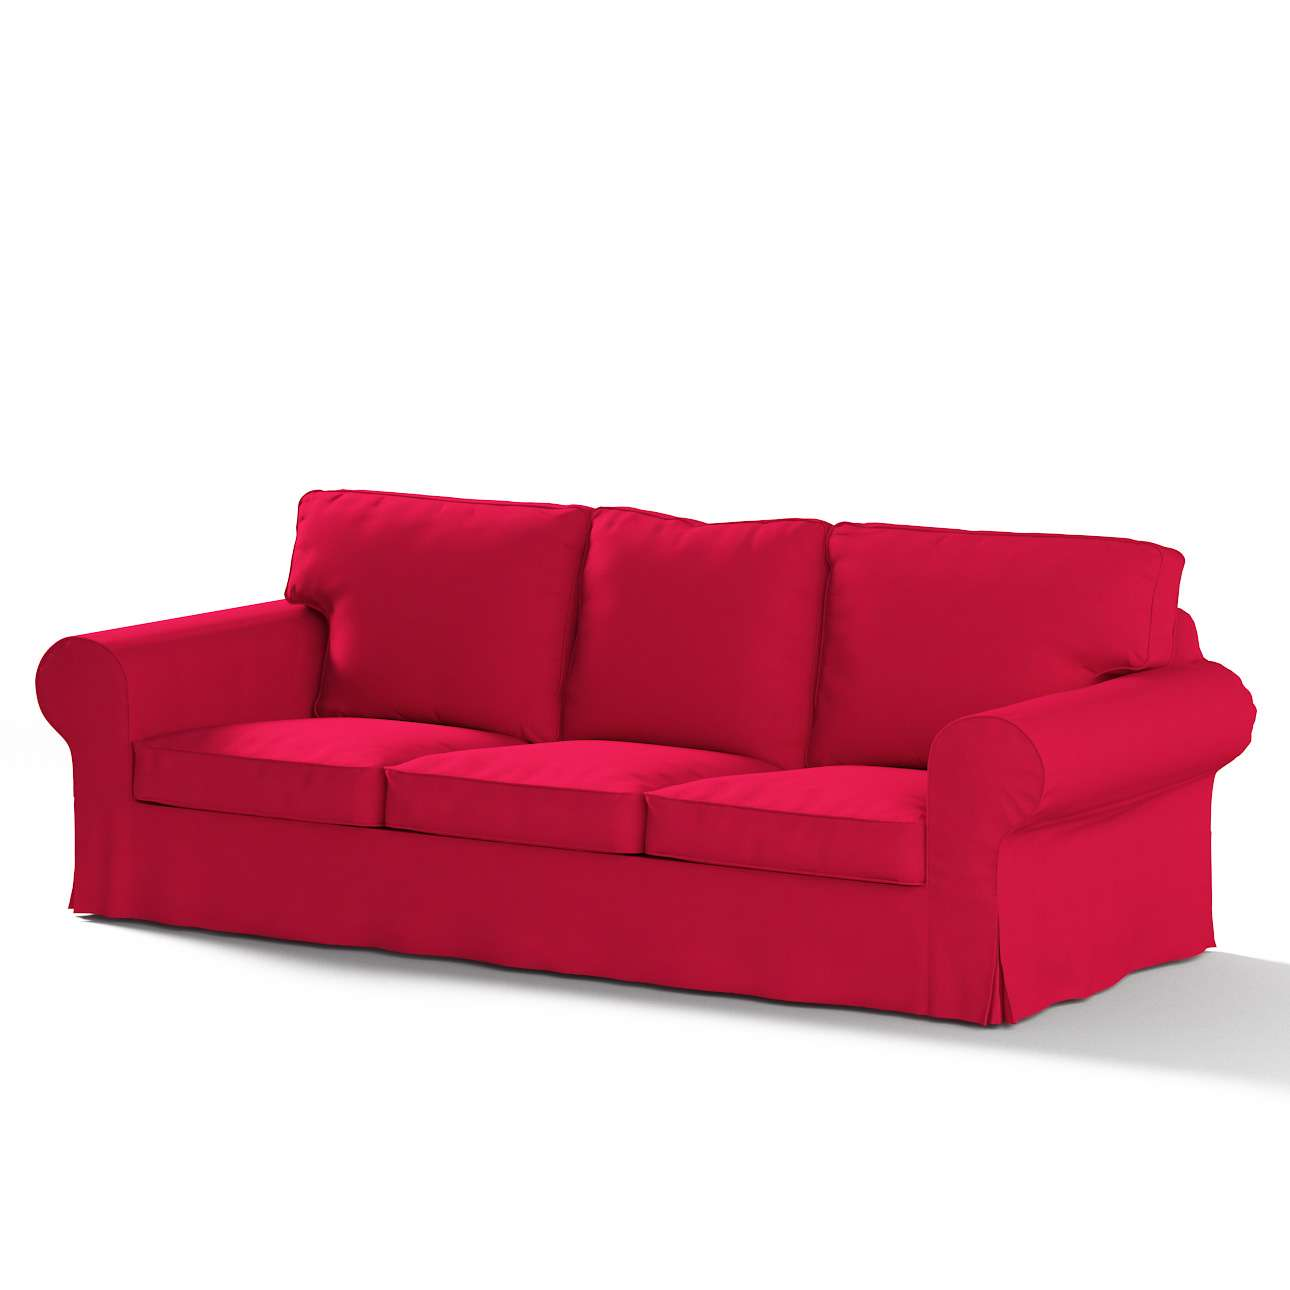 Ektorp 3-Sitzer Schlafsofabezug, ALTES Modell Sofahusse Ektorp 3-Sitzer Schlafsofa von der Kollektion Etna, Stoff: 705-60